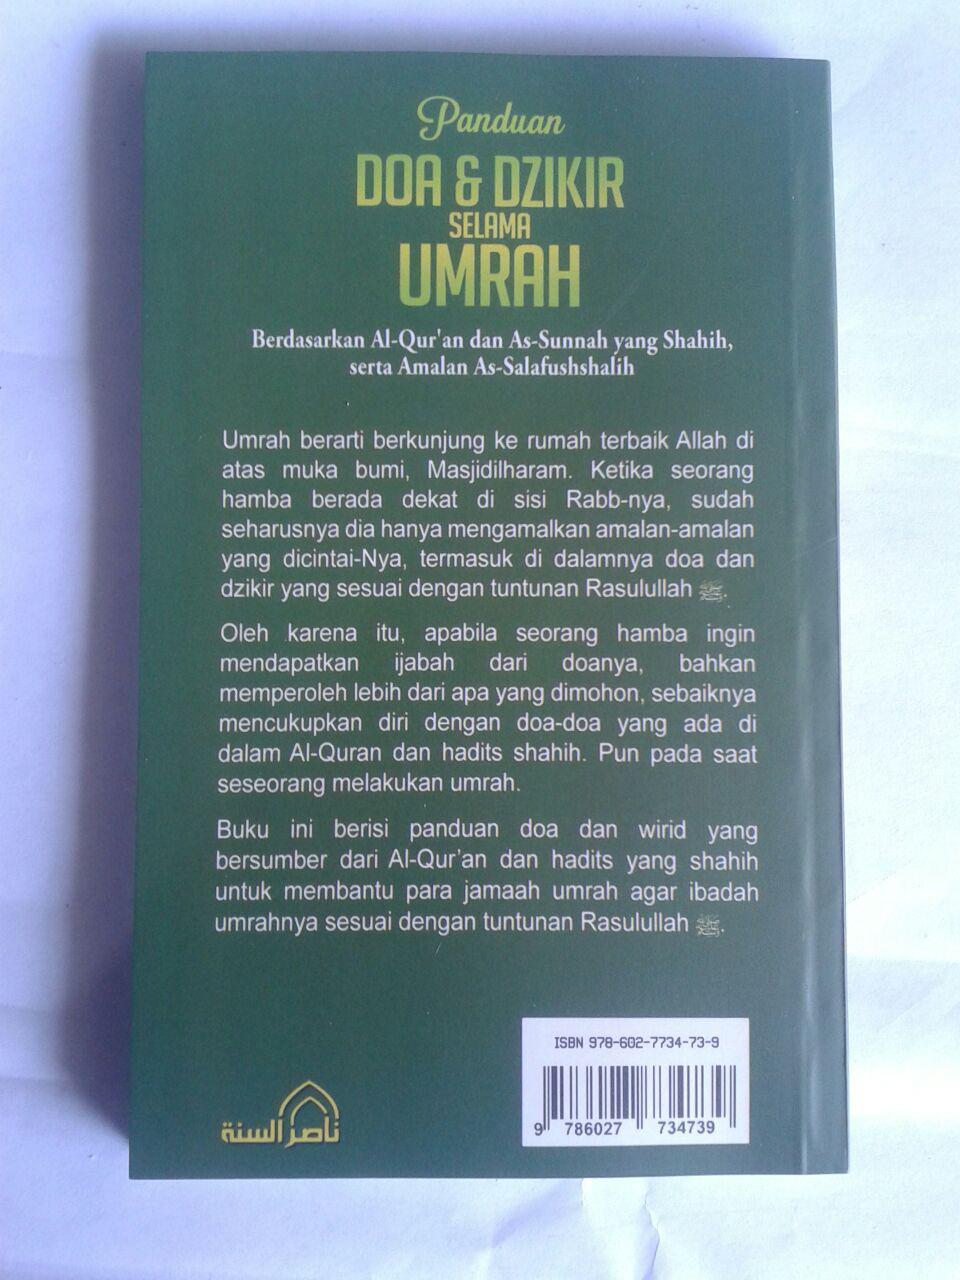 Buku Panduan Doa Dan Dzikir Selama Umrah cover